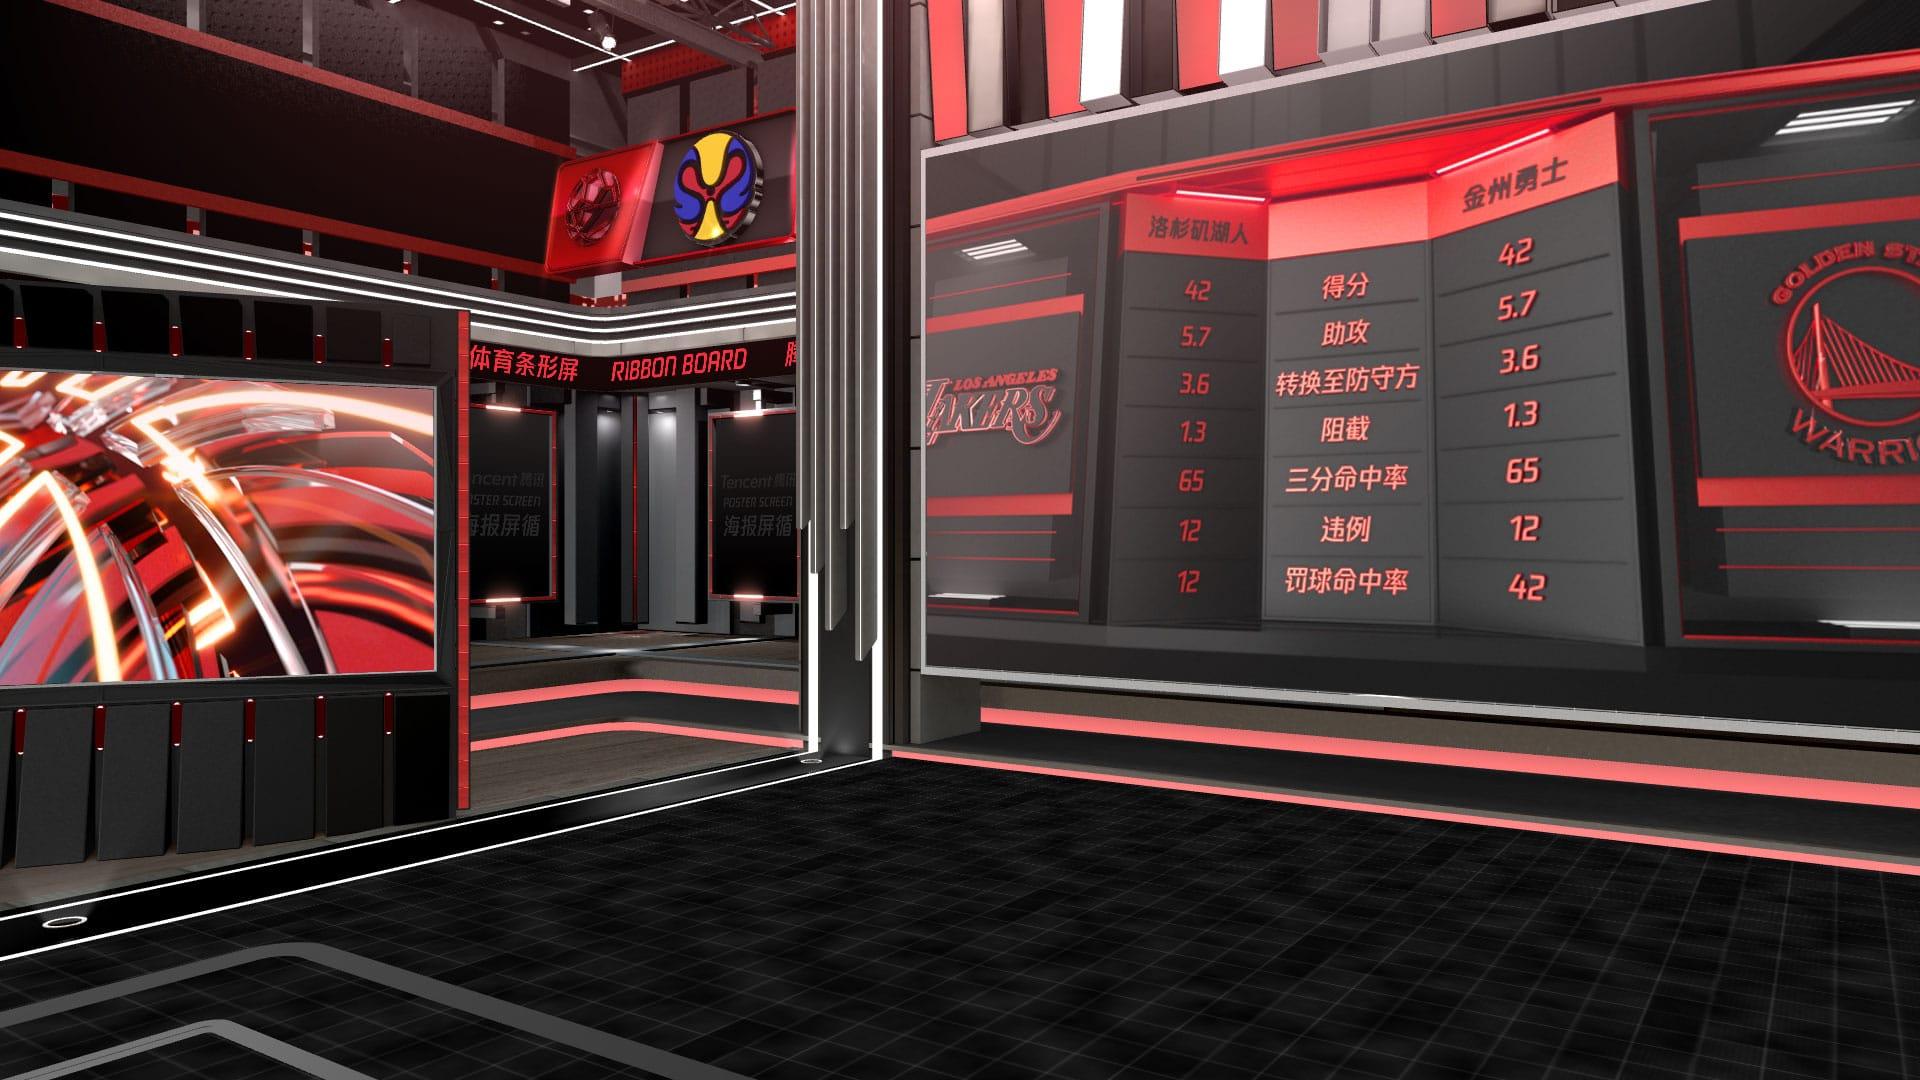 2019 Tencent Virtual Set 01 Girraphic